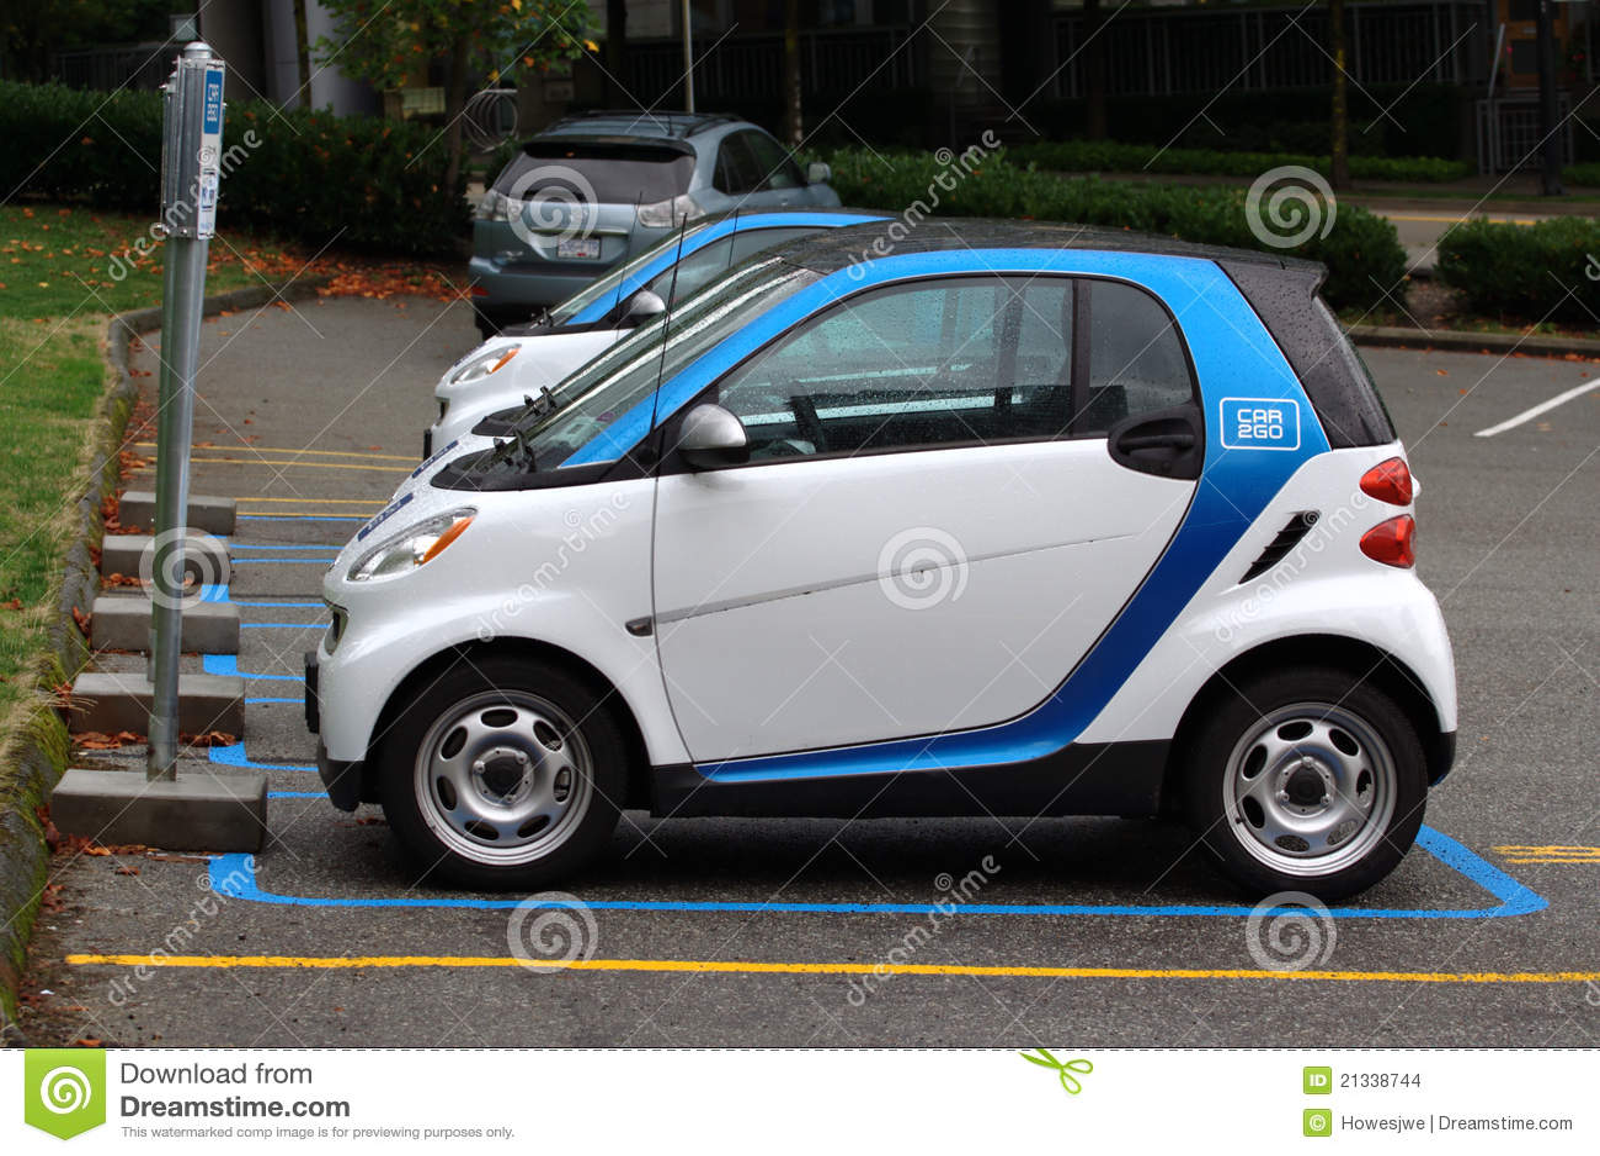 Rental Cars In Vancover